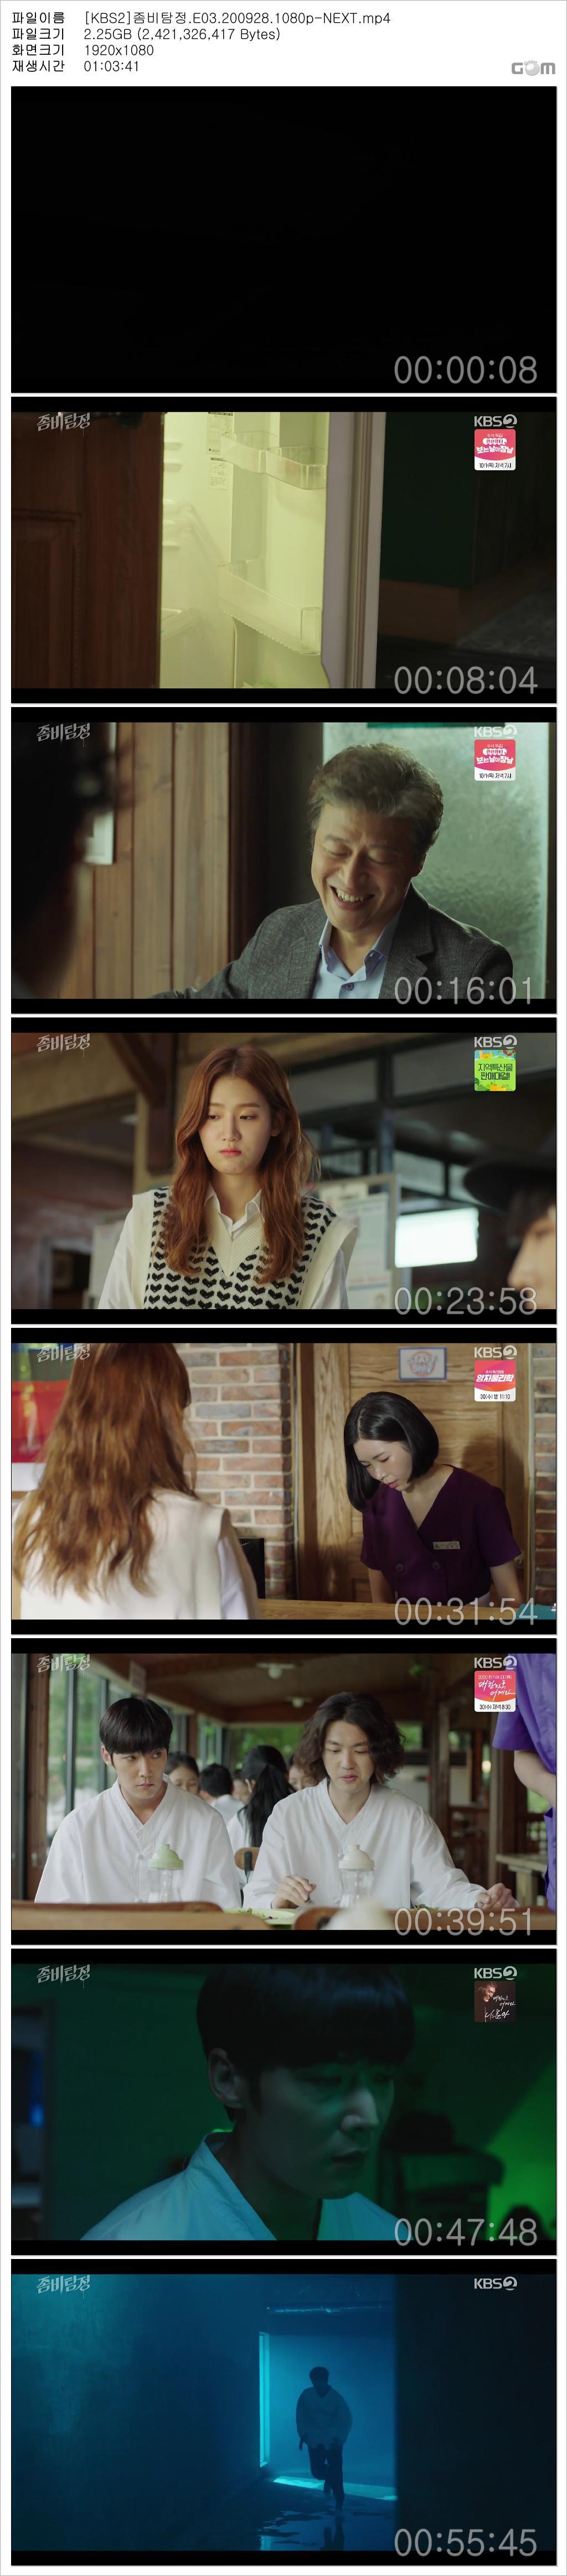 <b>[KBS2]좀비탐정.E03.200928.1080p-NEXT</b>